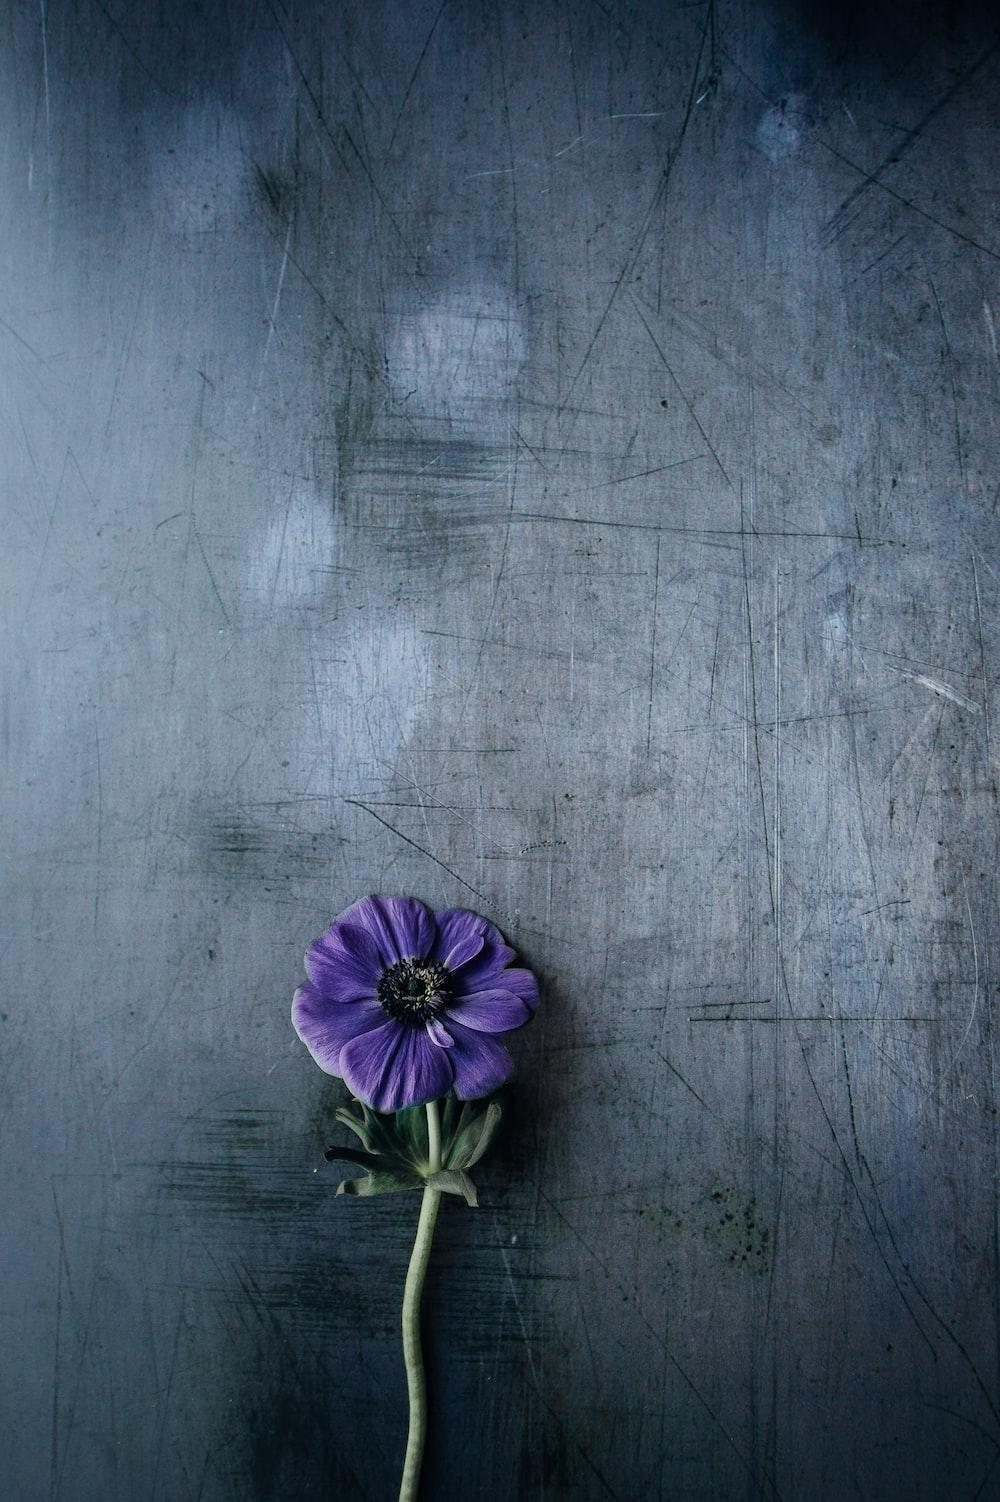 purple petaled flower on gray surface